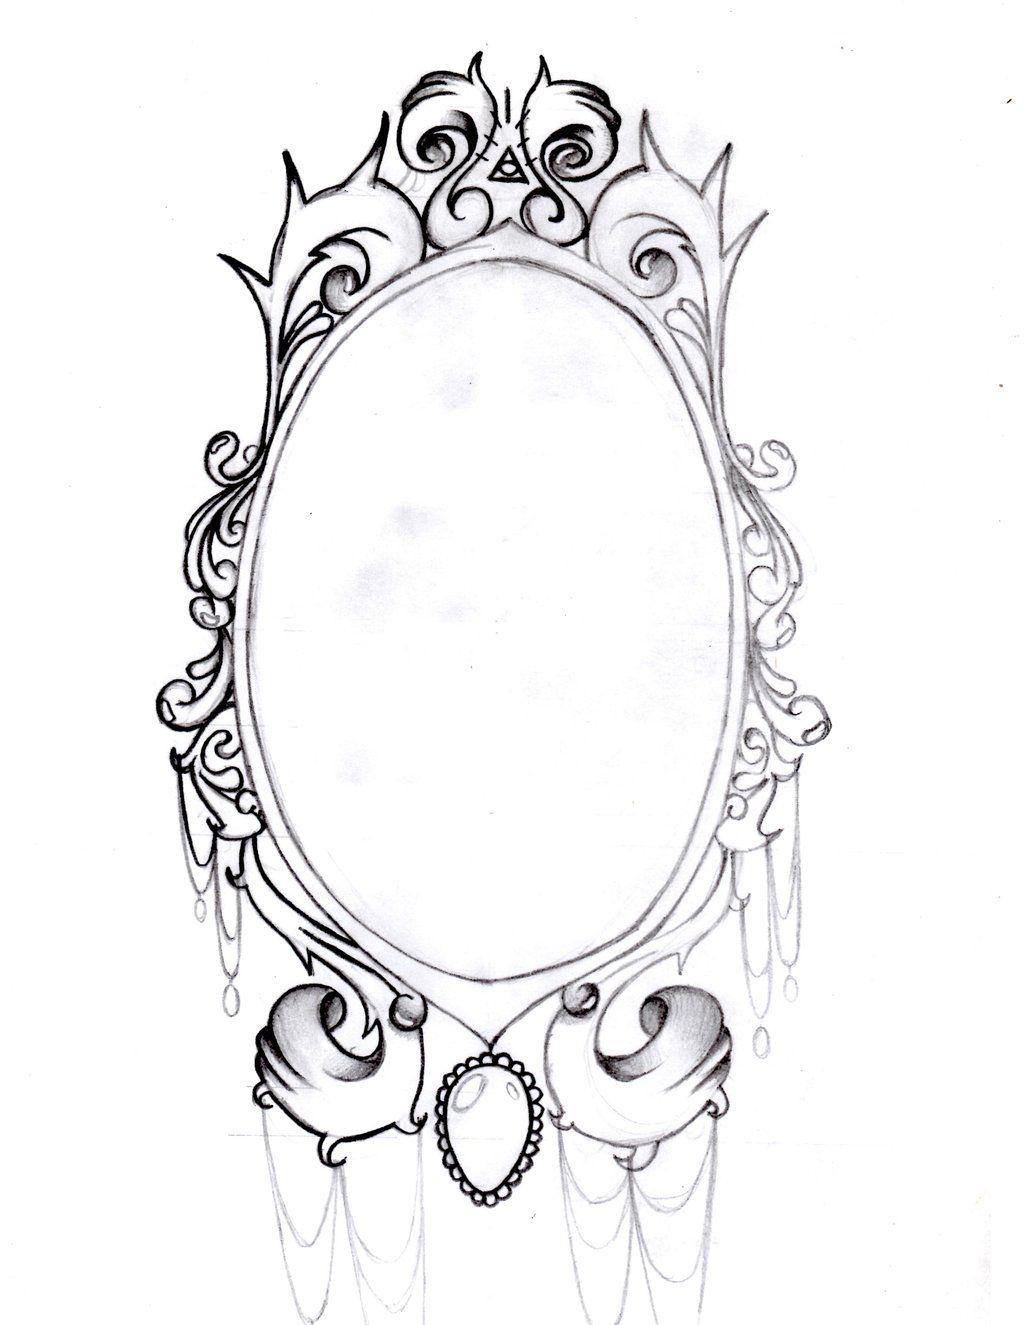 Vintage Mirror Frame By Aimstar On Deviantart Vintage Mirror Tattoo Mirror Drawings Mirror Tattoos